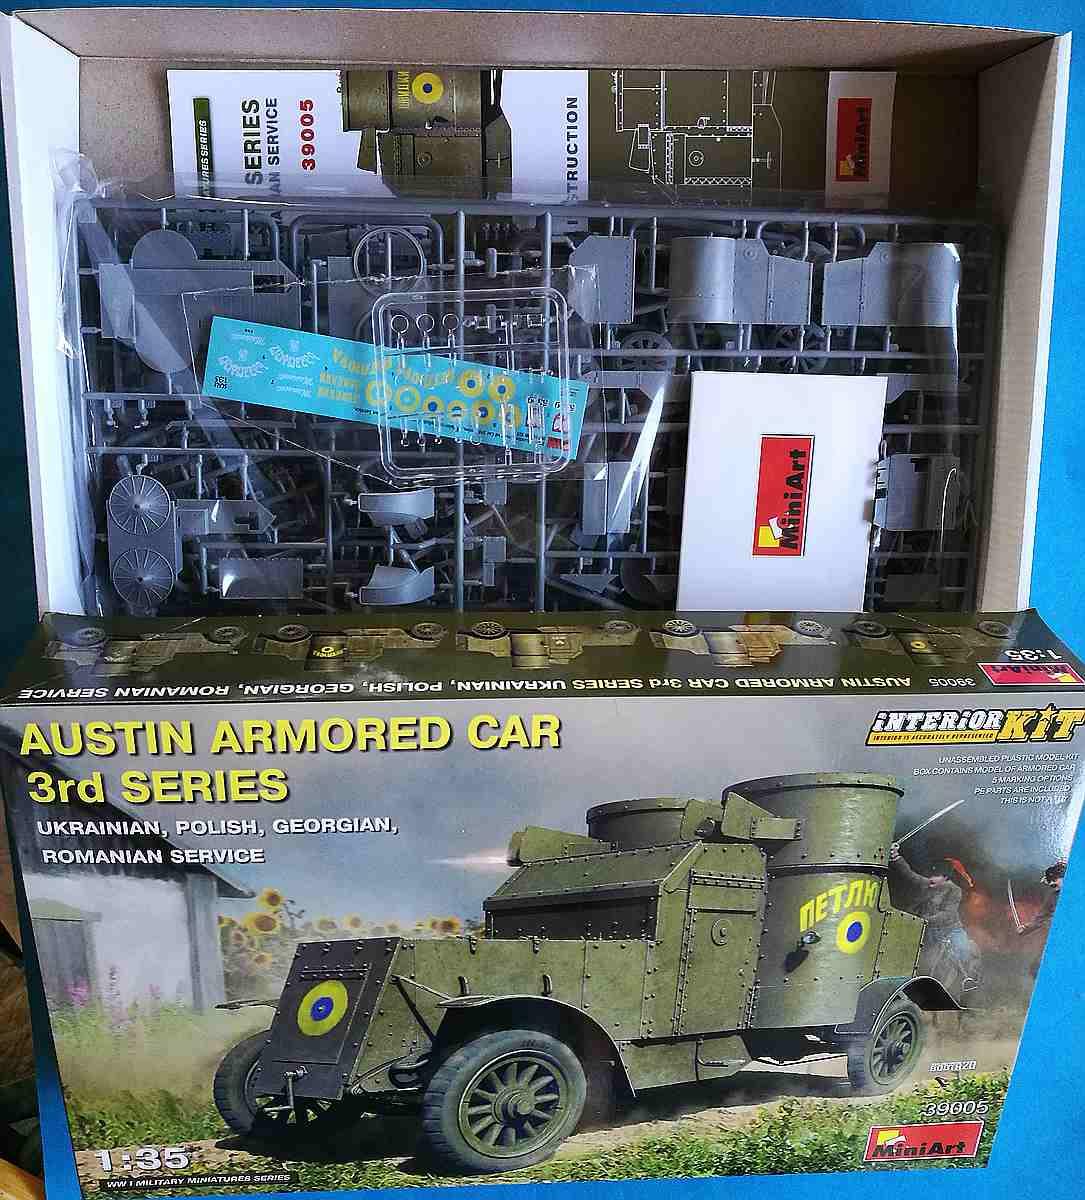 MiniArt-39005-Austin-Armoured-Car-3rd-series-31 Austin Armored Car 3rd Series in 1:35 von MiniArt #39005